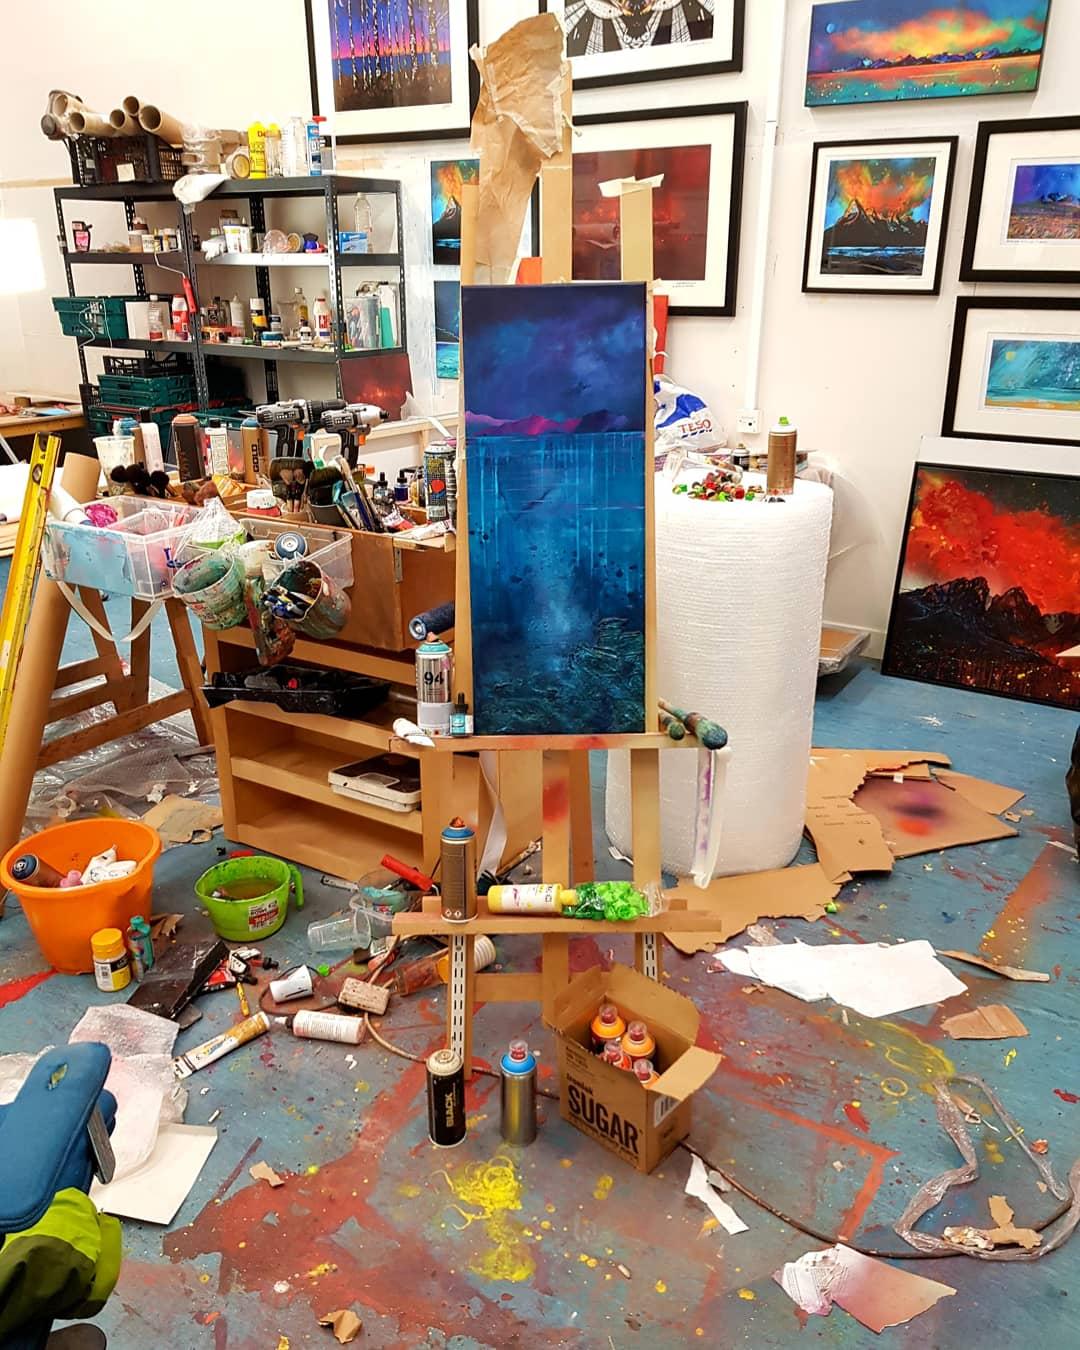 Coral Beach, Skye - Original painting In the studio 2